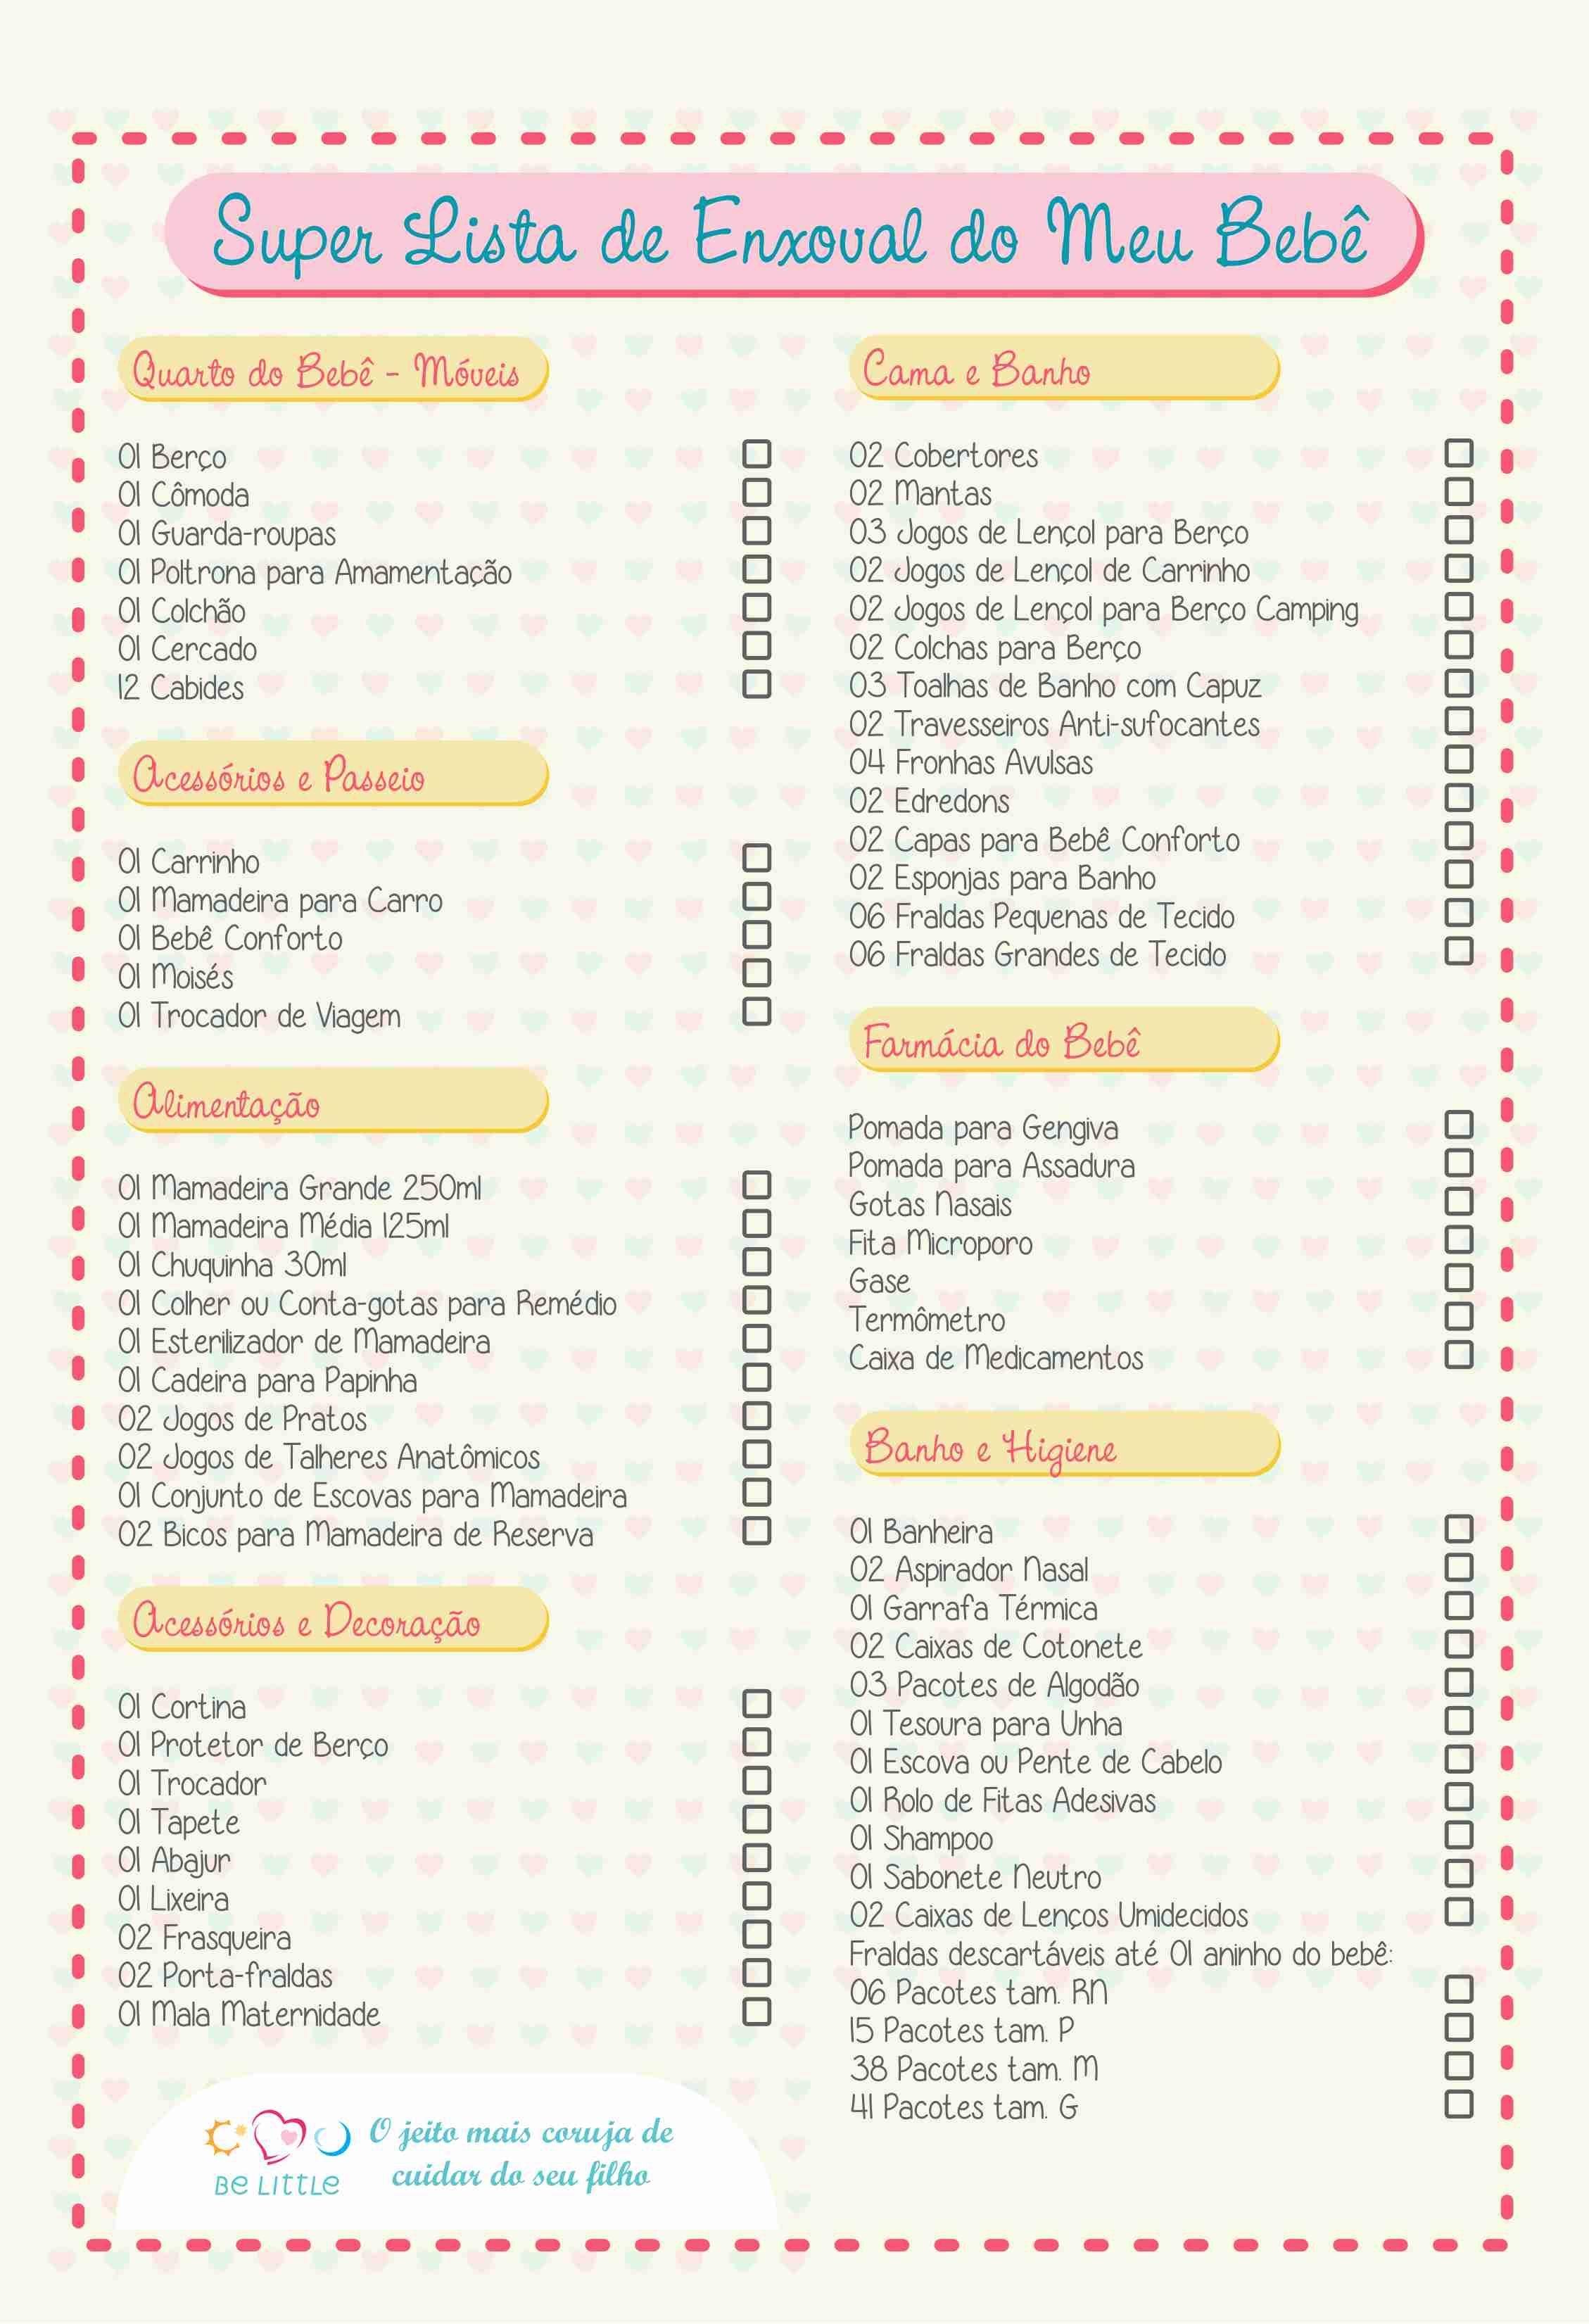 Fabuloso Super Lista de Enxoval | Chá do Noah | Pinterest | Enxoval, Bebês  VU01